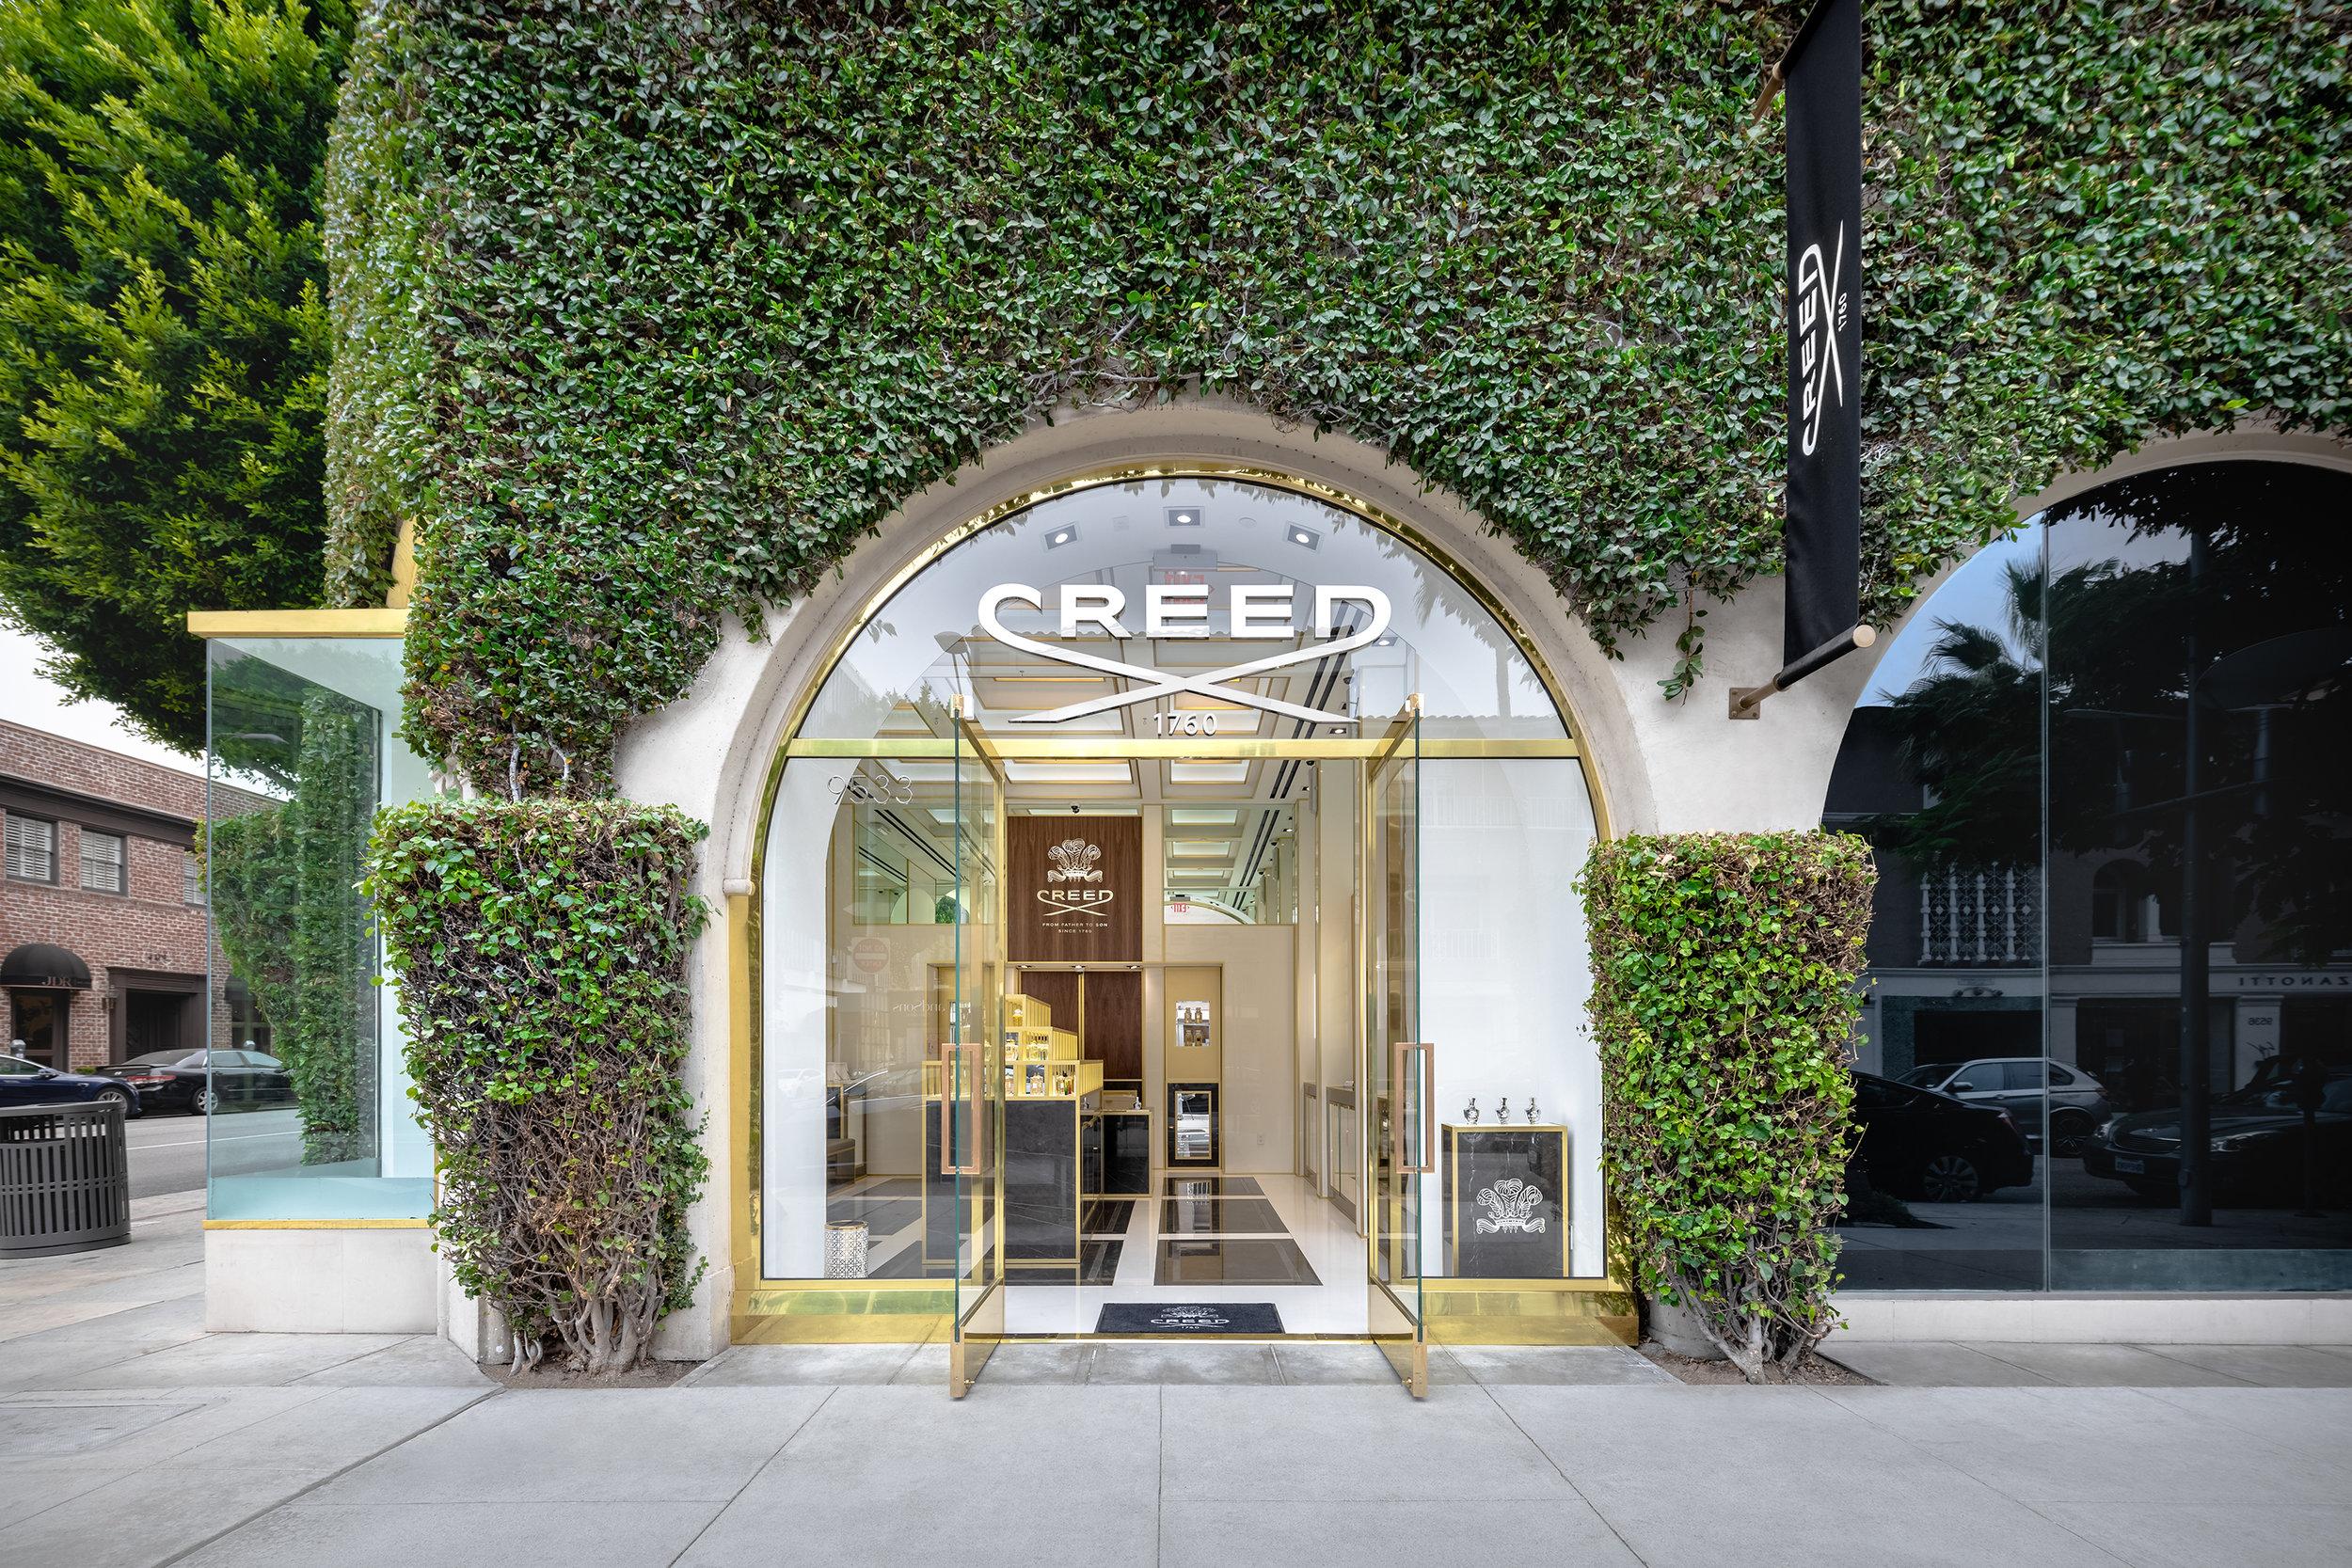 Creed_BH-20180925-13.jpg